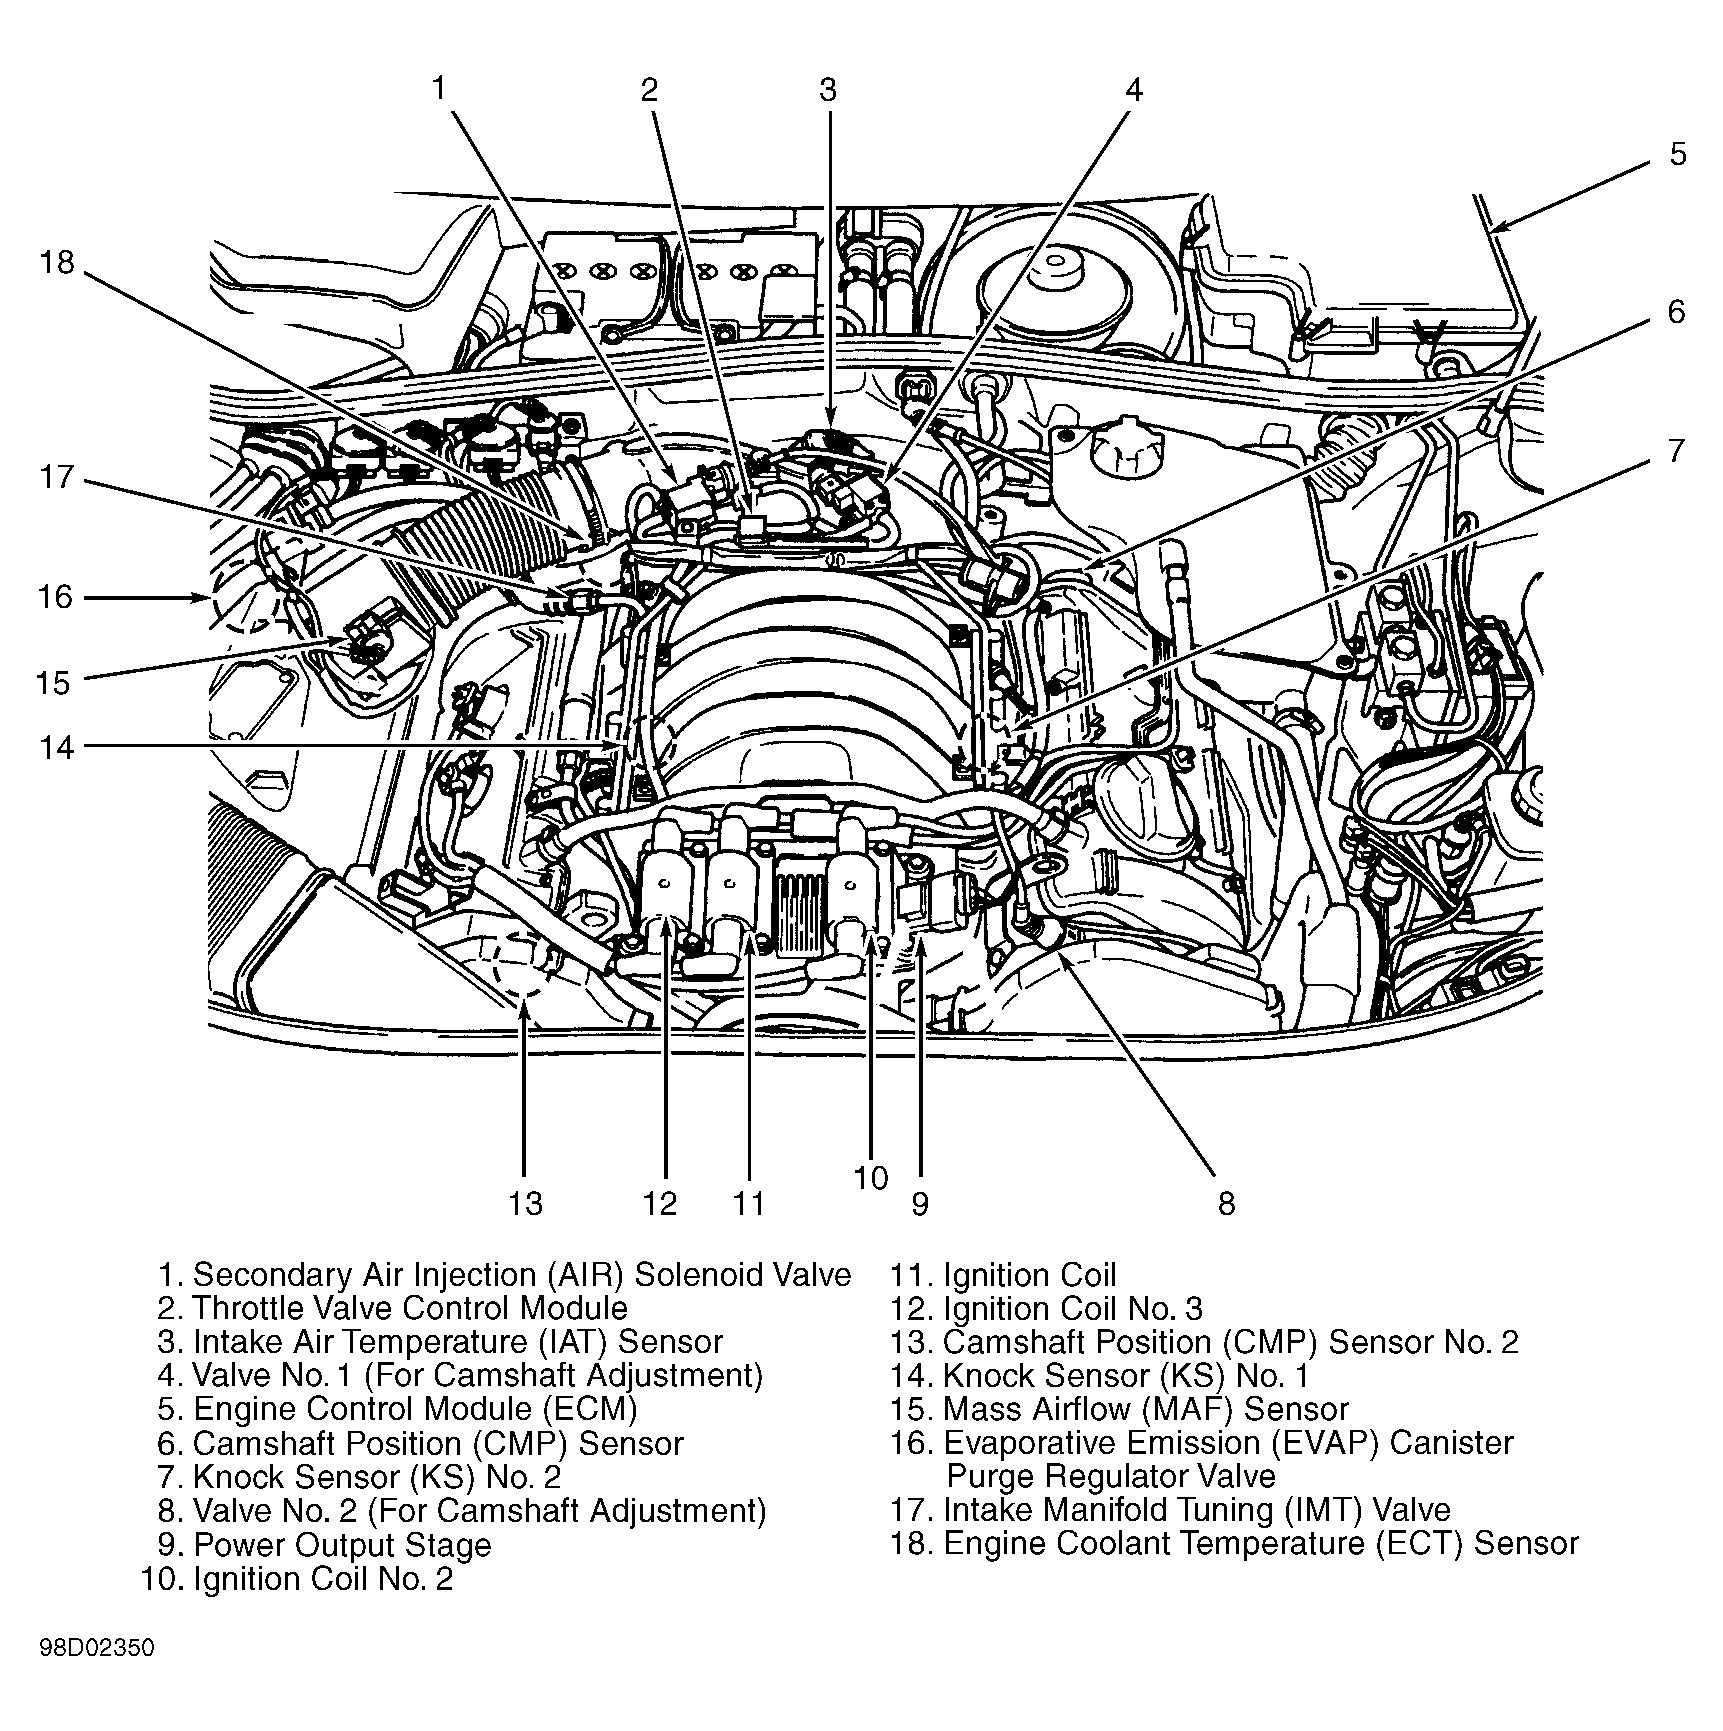 Toyota 3 0 V6 Engine Diagram V6 Engine Diagram 3 8 1984 Diagram Data Schema Exp Of Toyota 3 0 V6 Engine Diagram